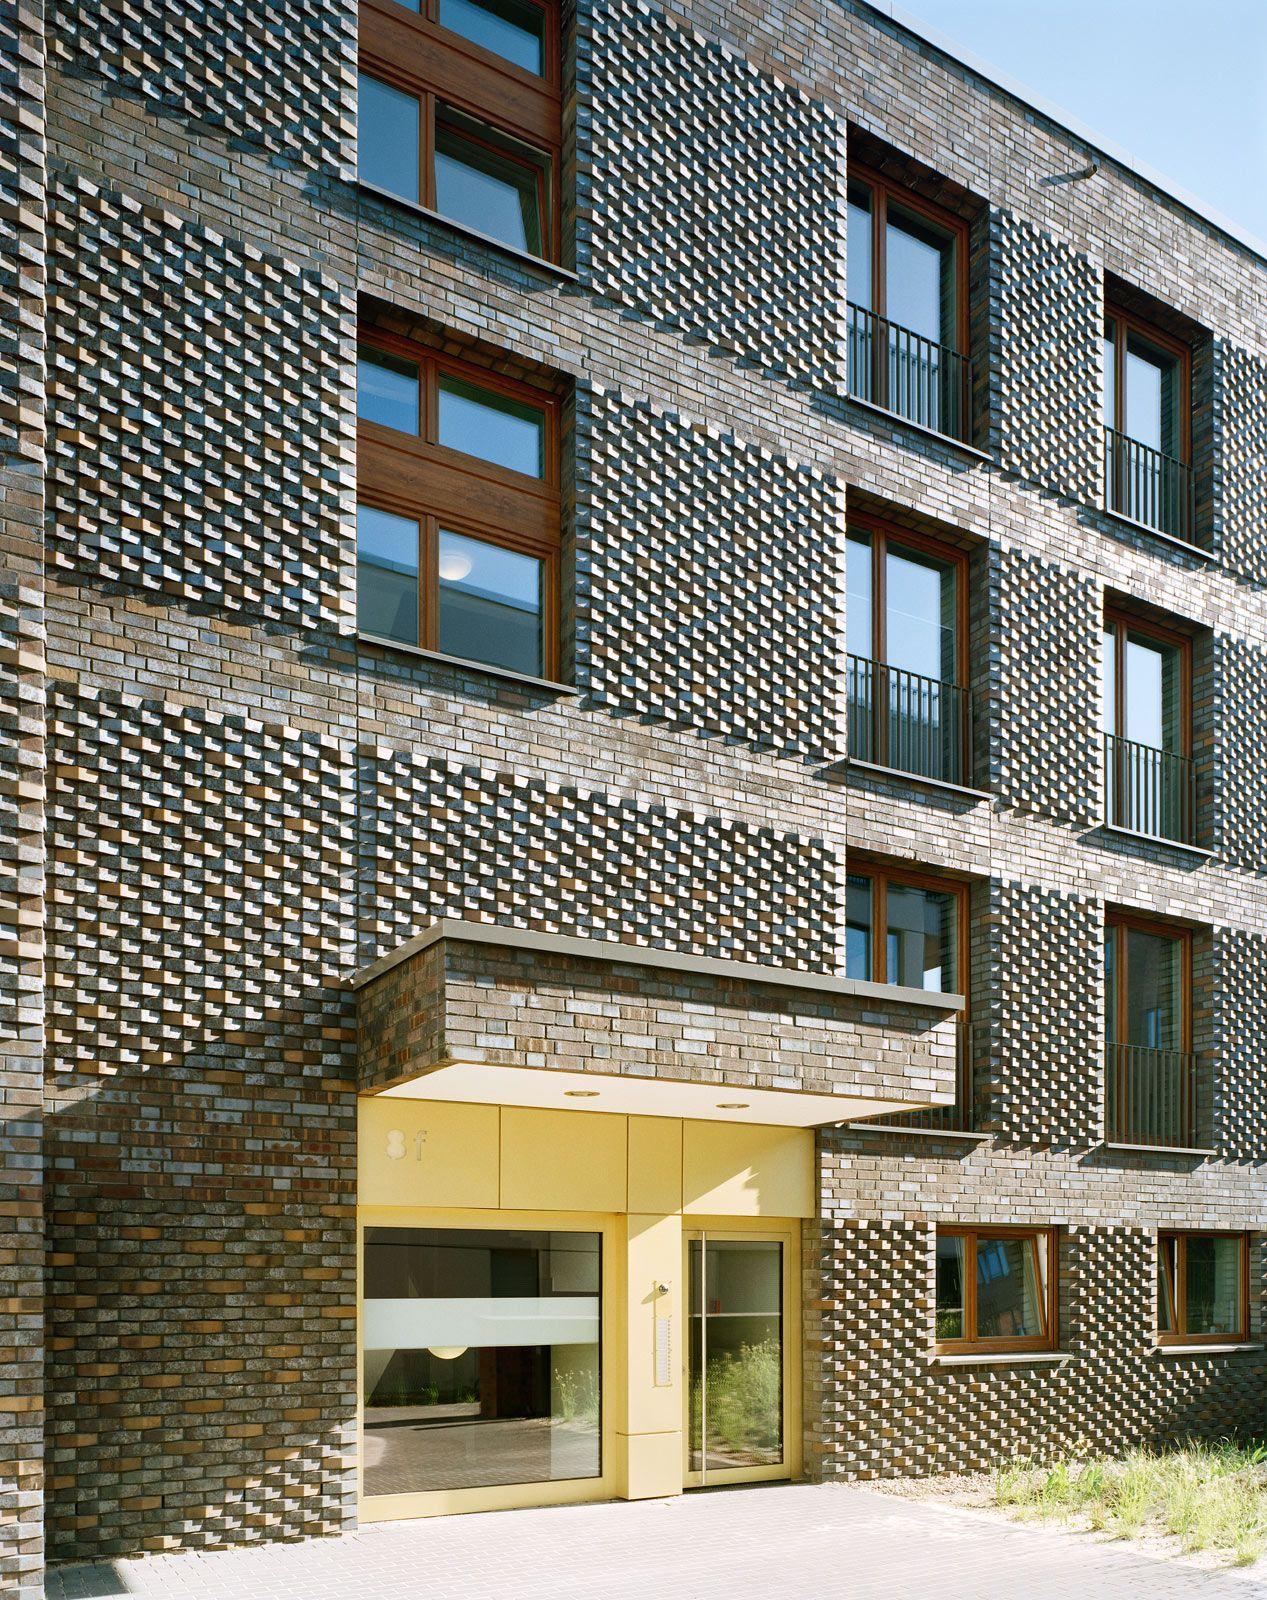 Architekt Emsdetten kbnk architekten hamburg architekten design forever